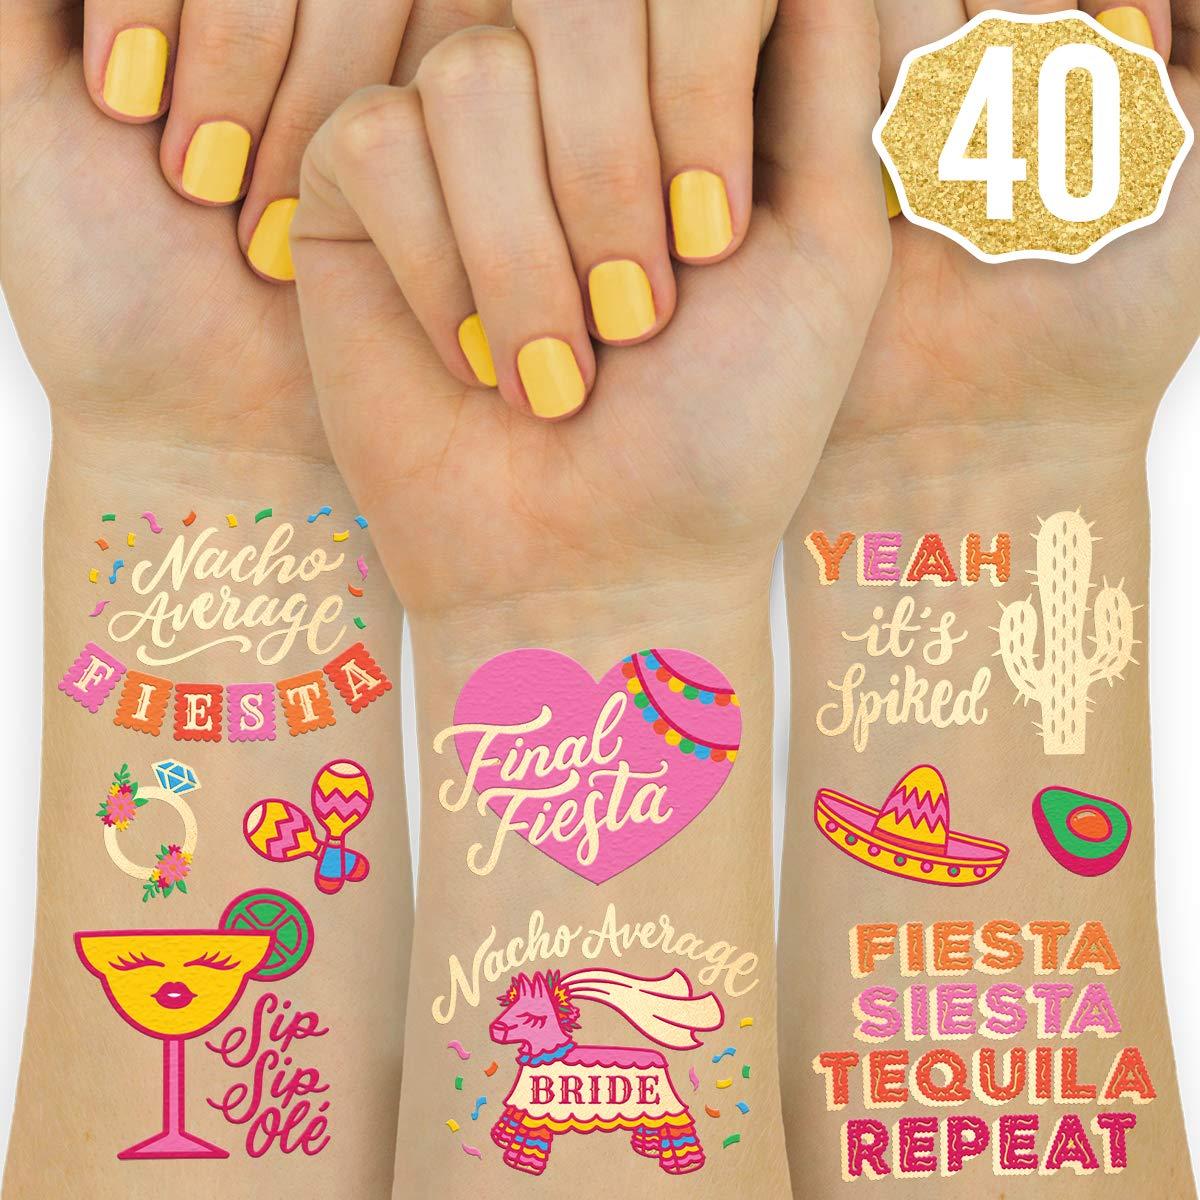 xo, Fetti Final Fiesta Bachelorette Tattoos - 40 styles | Bach Party Decorations, Nacho Average Bride